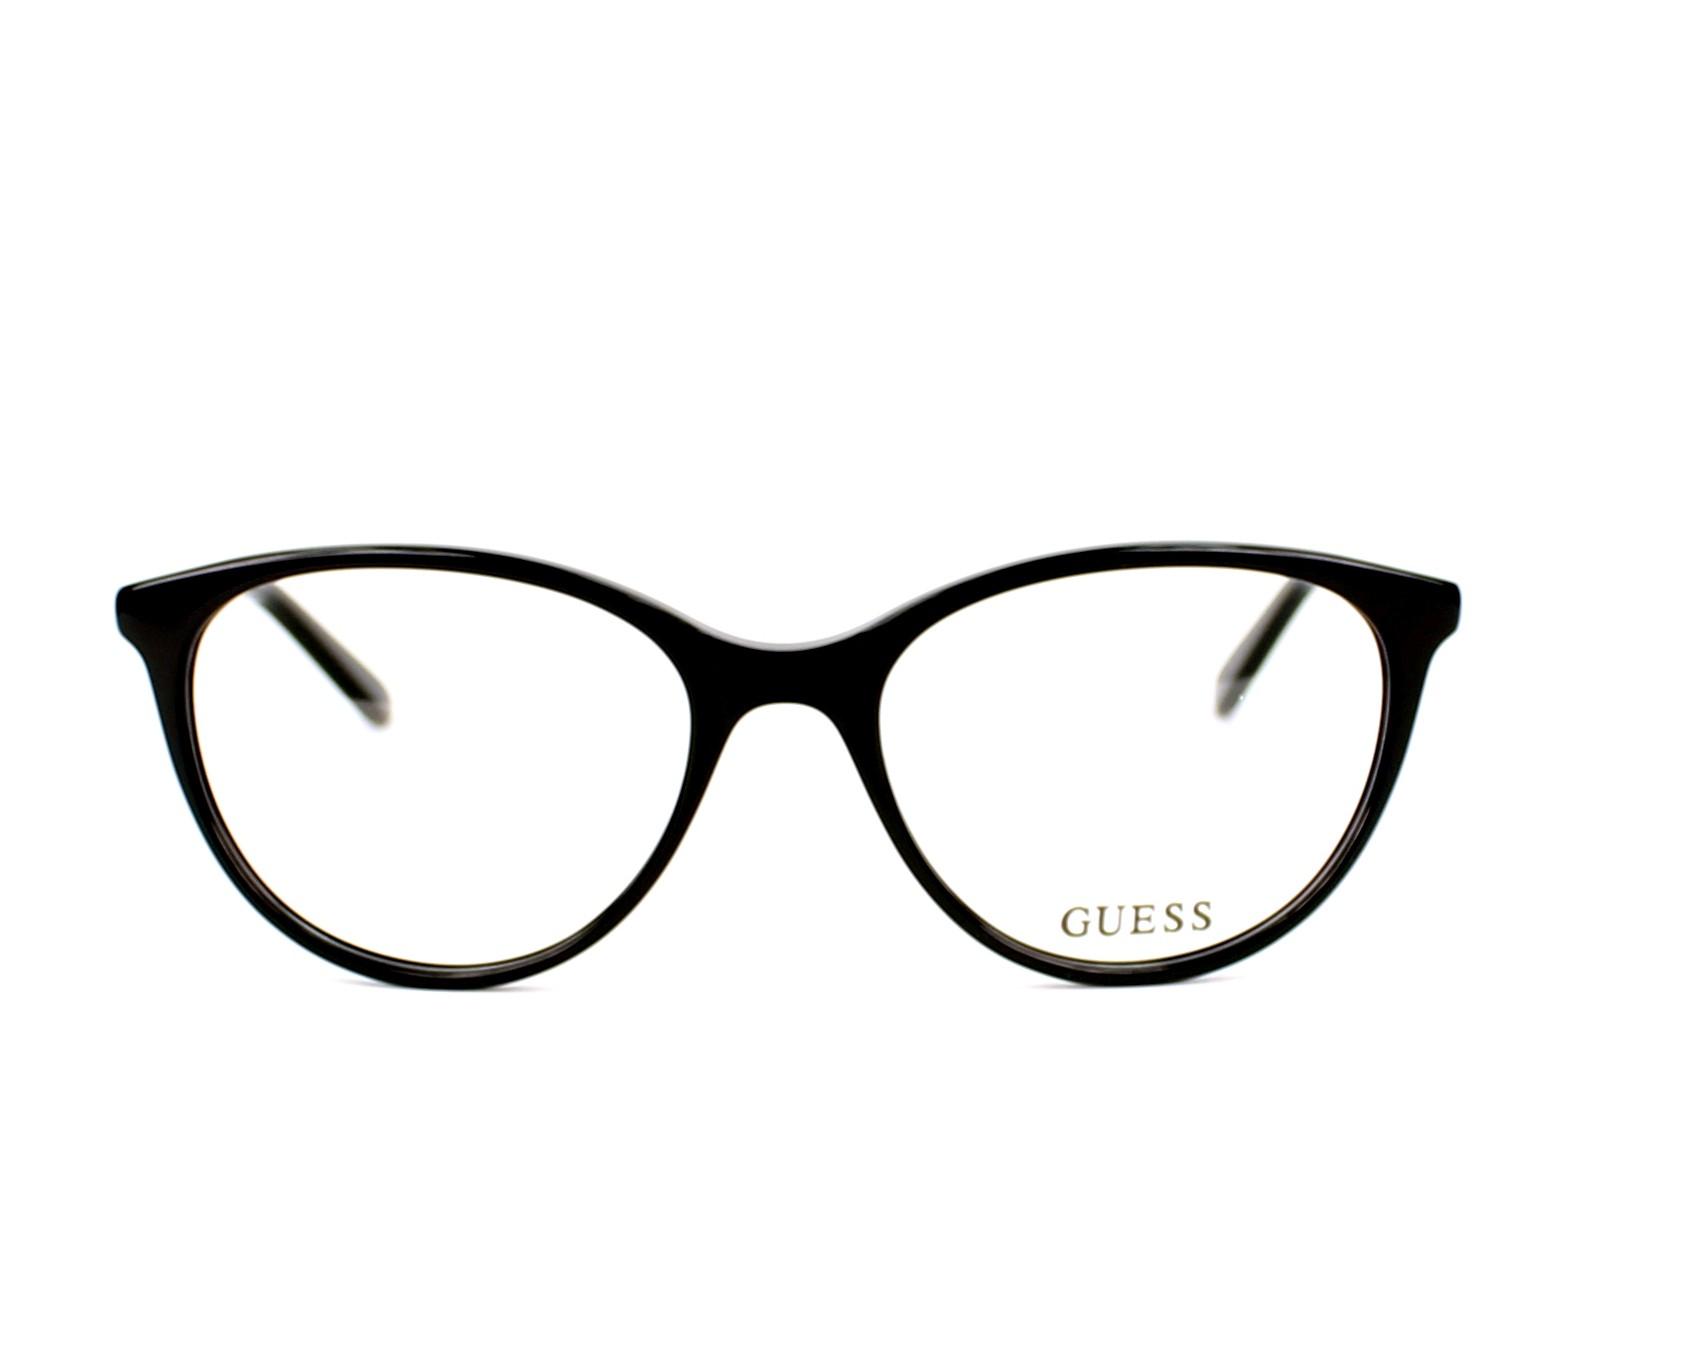 a0630650eba eyeglasses Guess GU-2565 005 52-17 Black Gold Copper front view